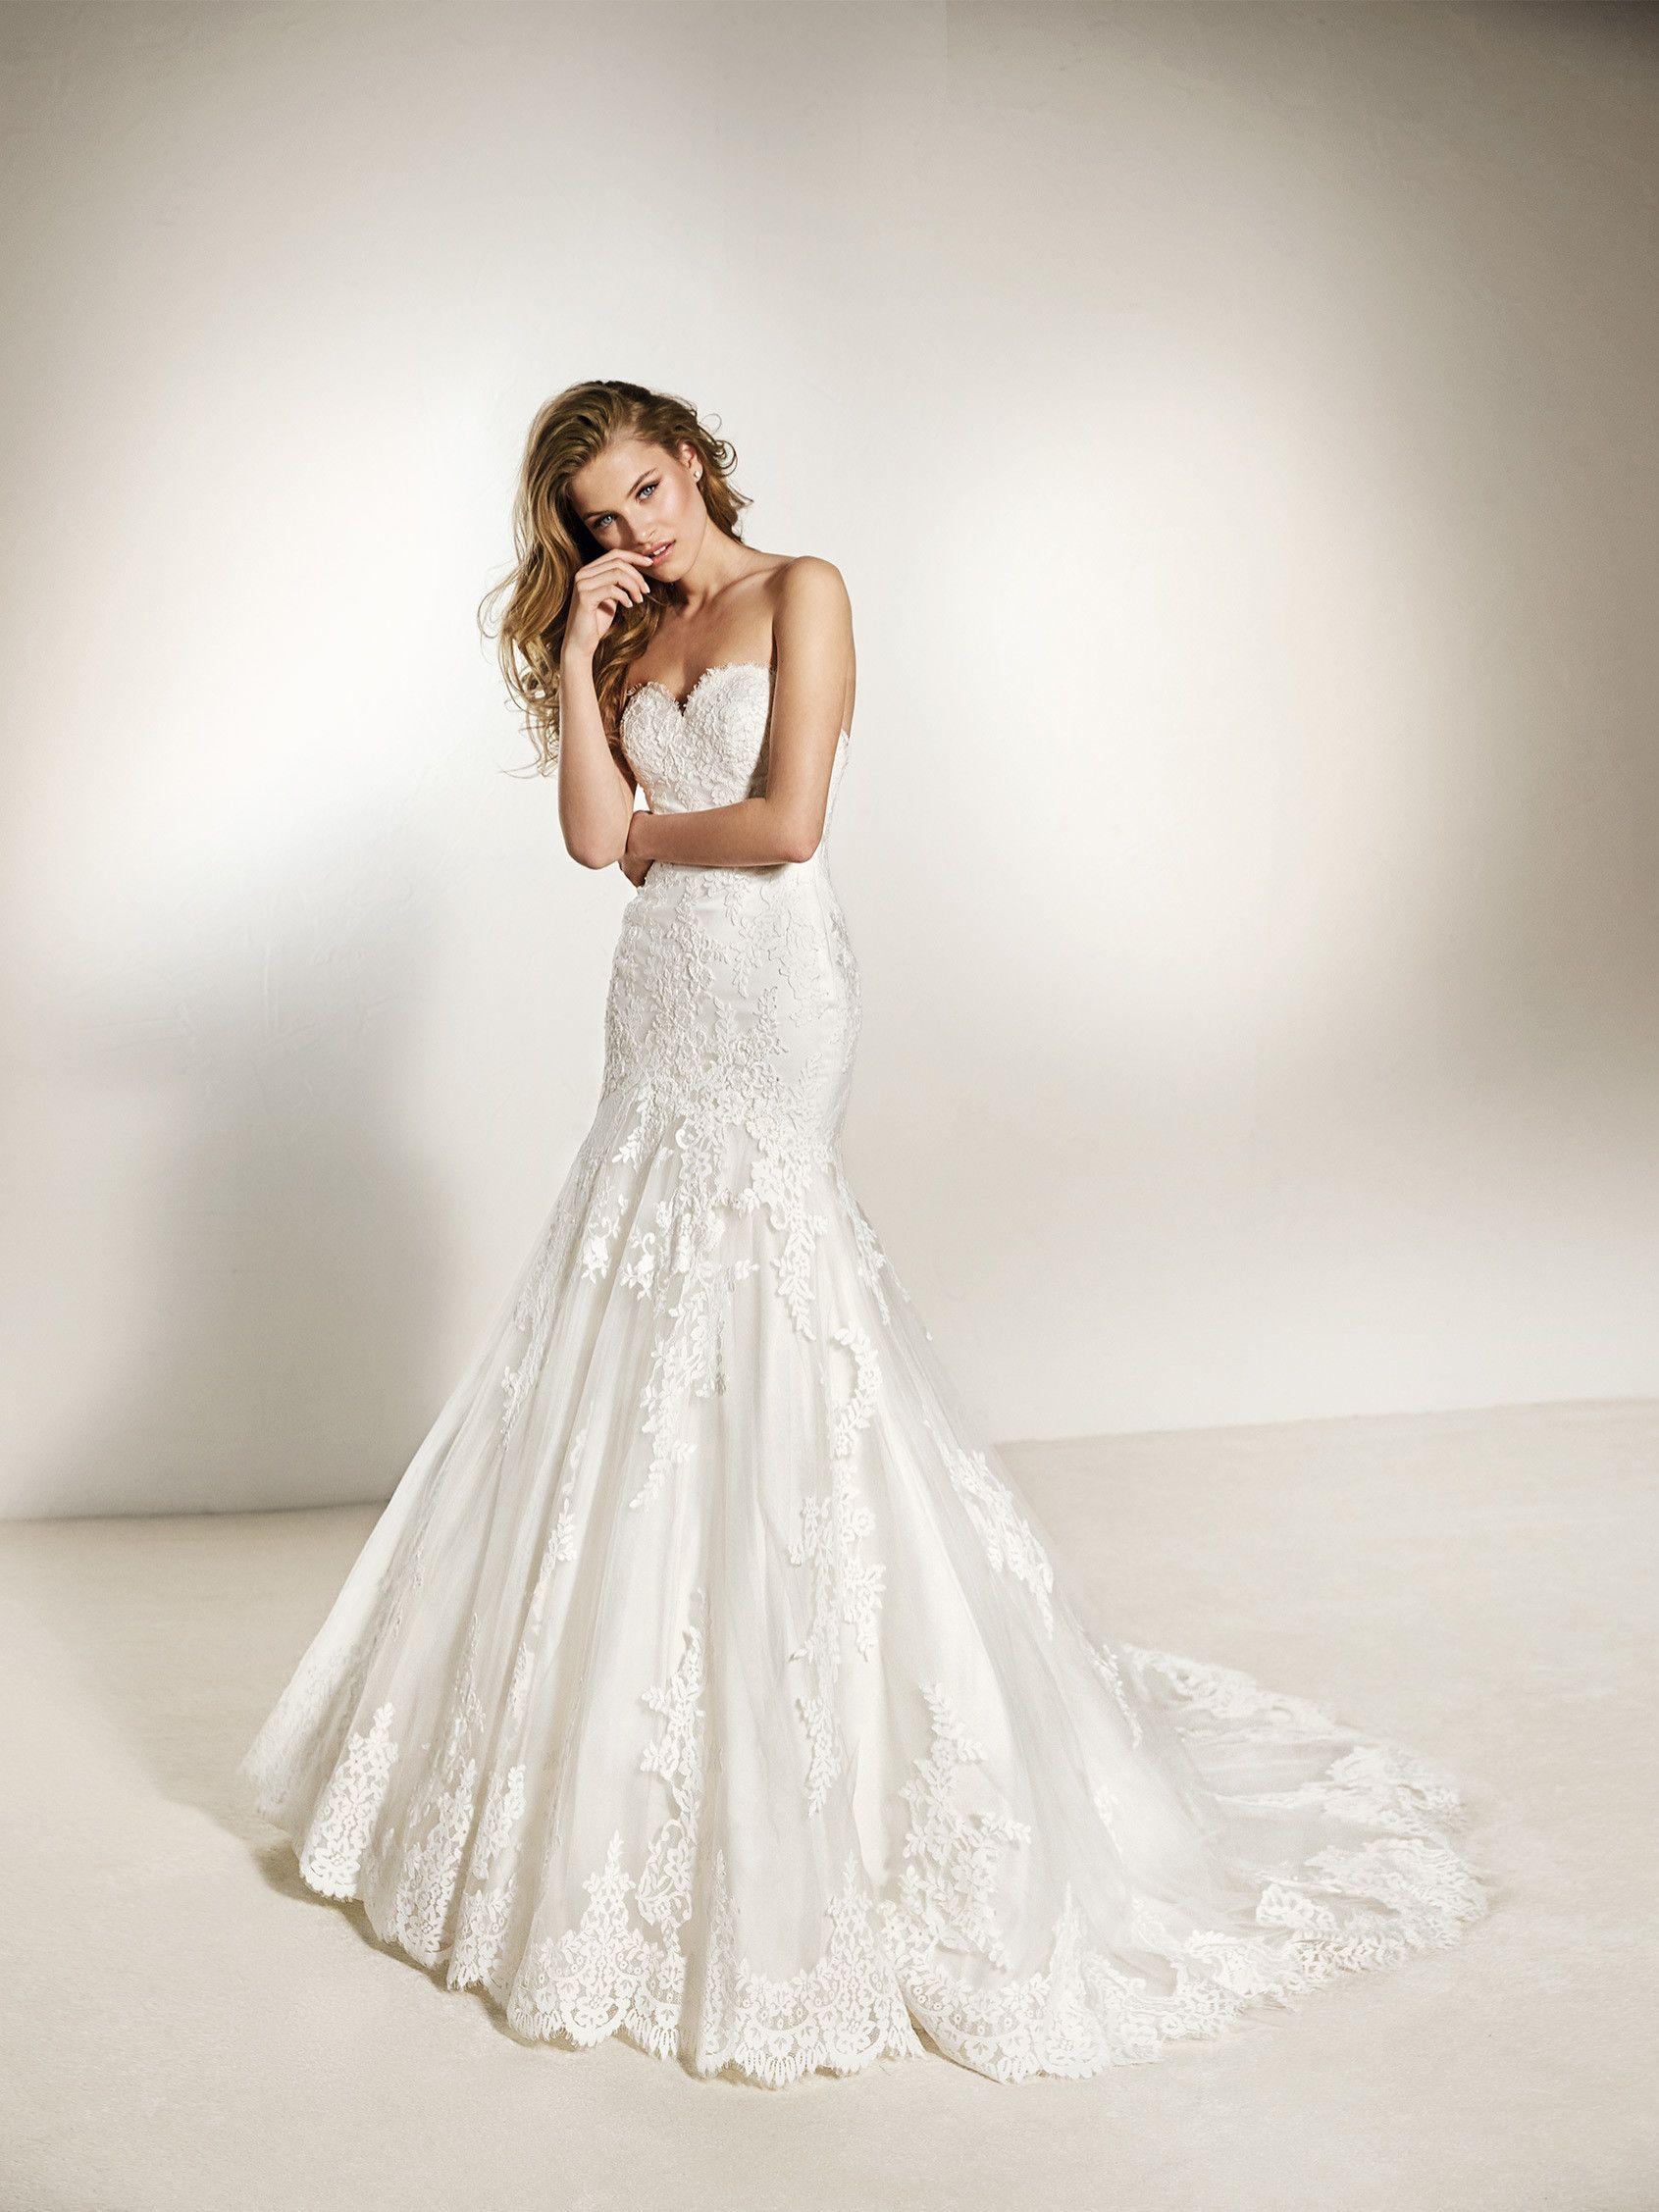 Wedding Dress Feminine Ovias 2018 Collection